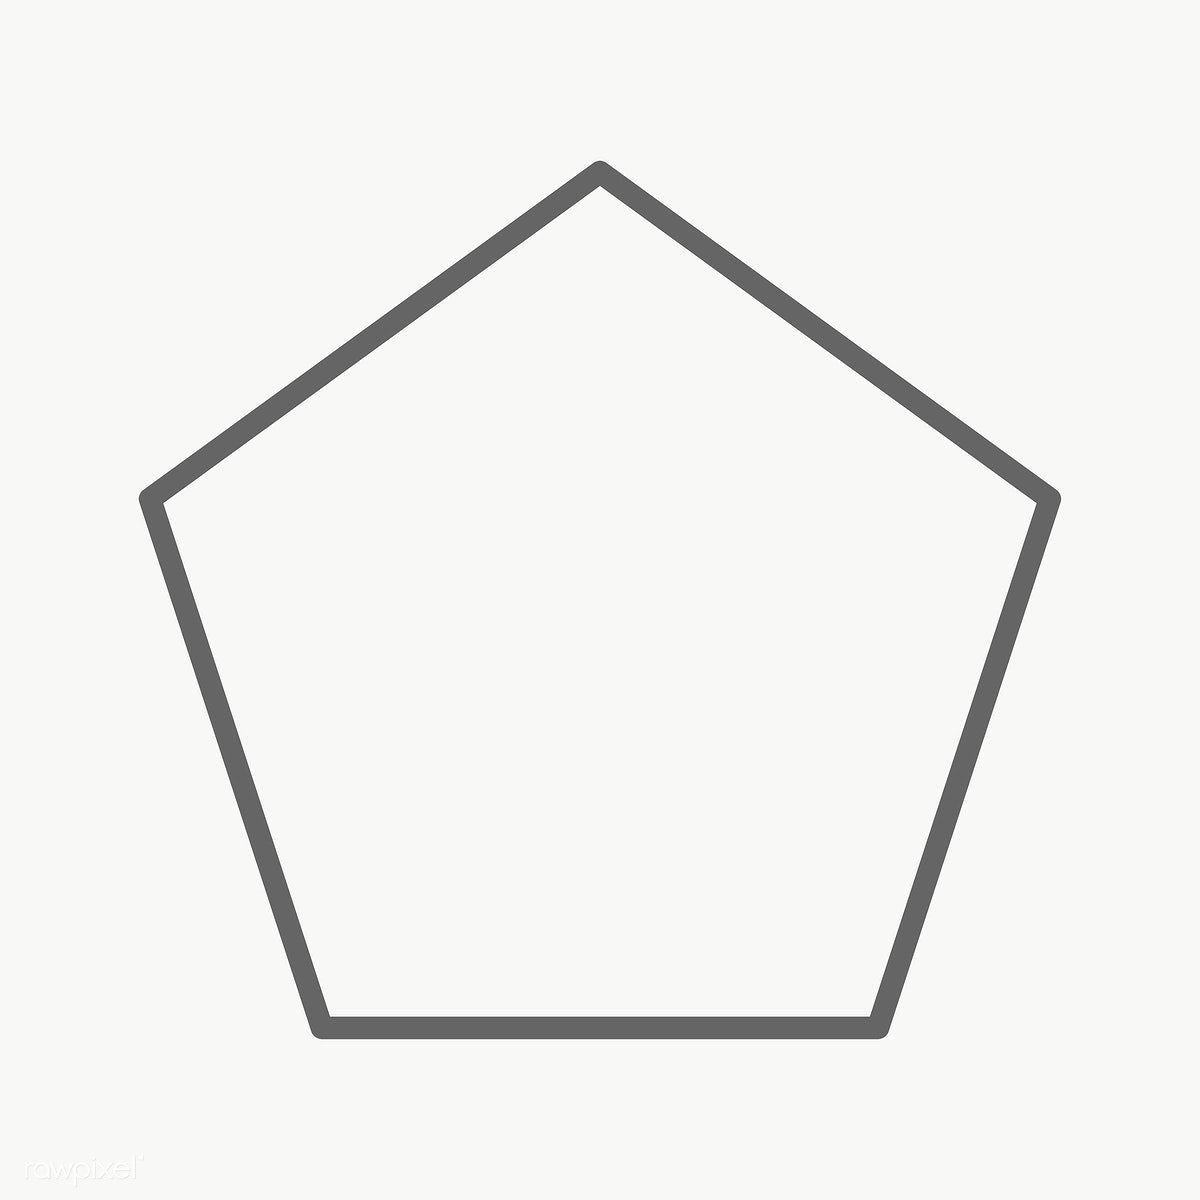 Stroke Pentagon Geometric Shape Transparent Png Free Image By Rawpixel Com Ningzk V Geometric Shapes Printable Designs Geometric